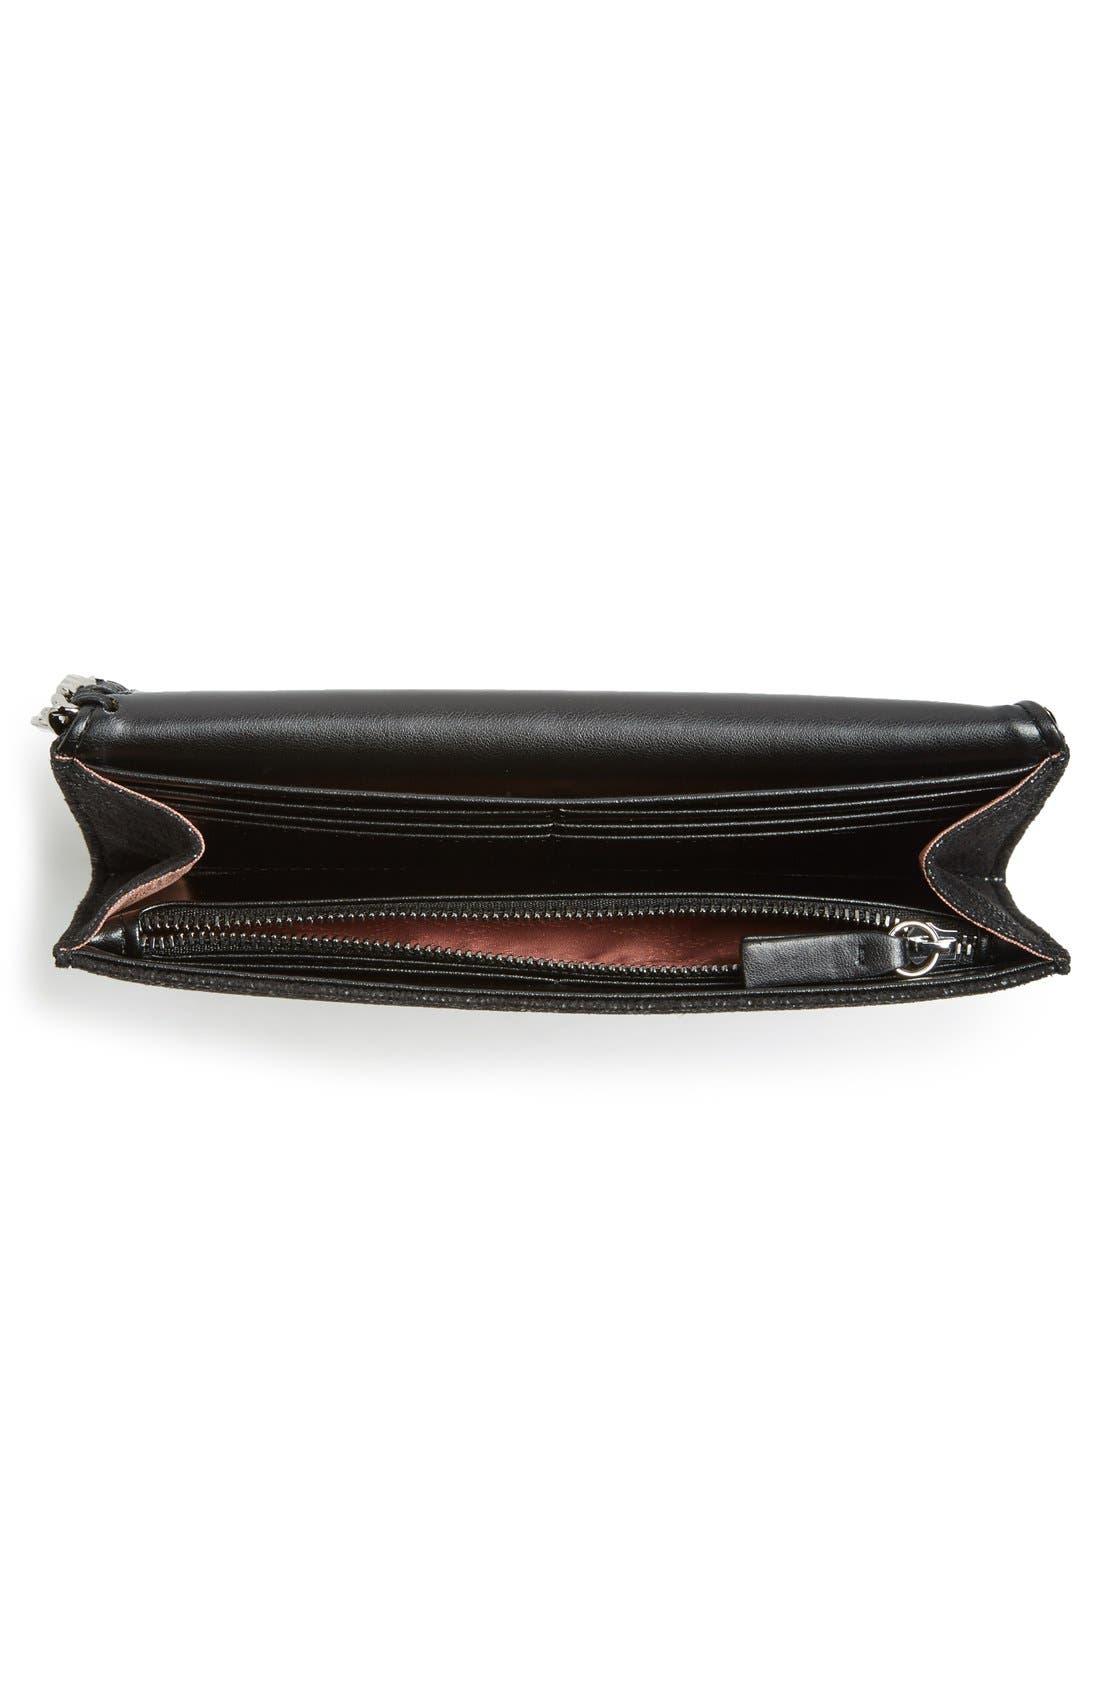 'Falabella - Rainbow POP' Faux Leather Continental Wallet,                             Alternate thumbnail 2, color,                             Black